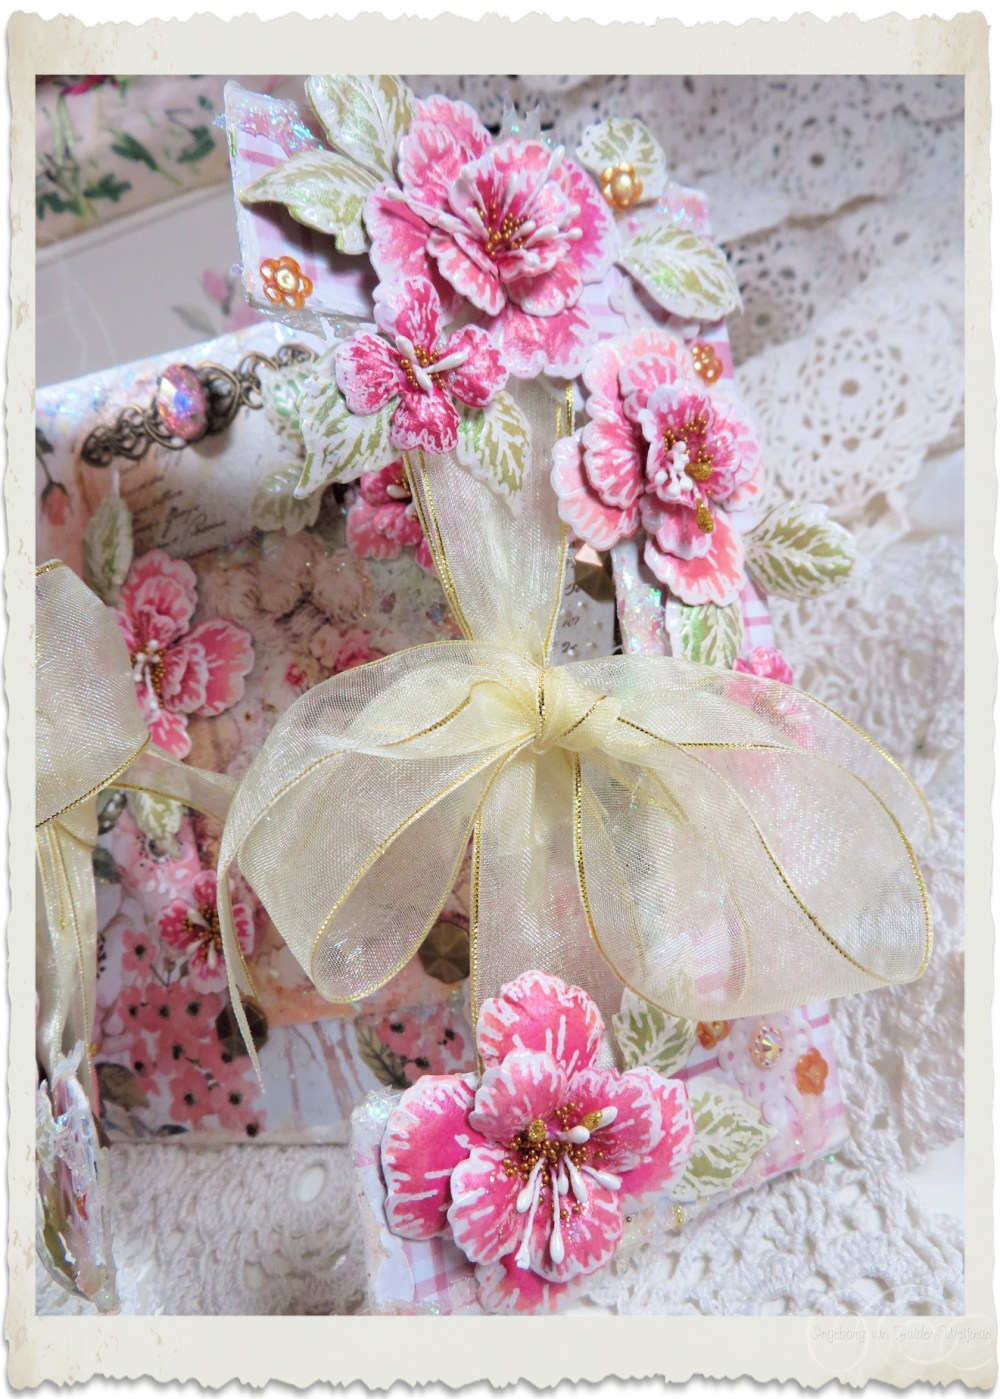 Details of right side of handmade card with Oakberry Lane flowers by Ingeborg van Zuiden